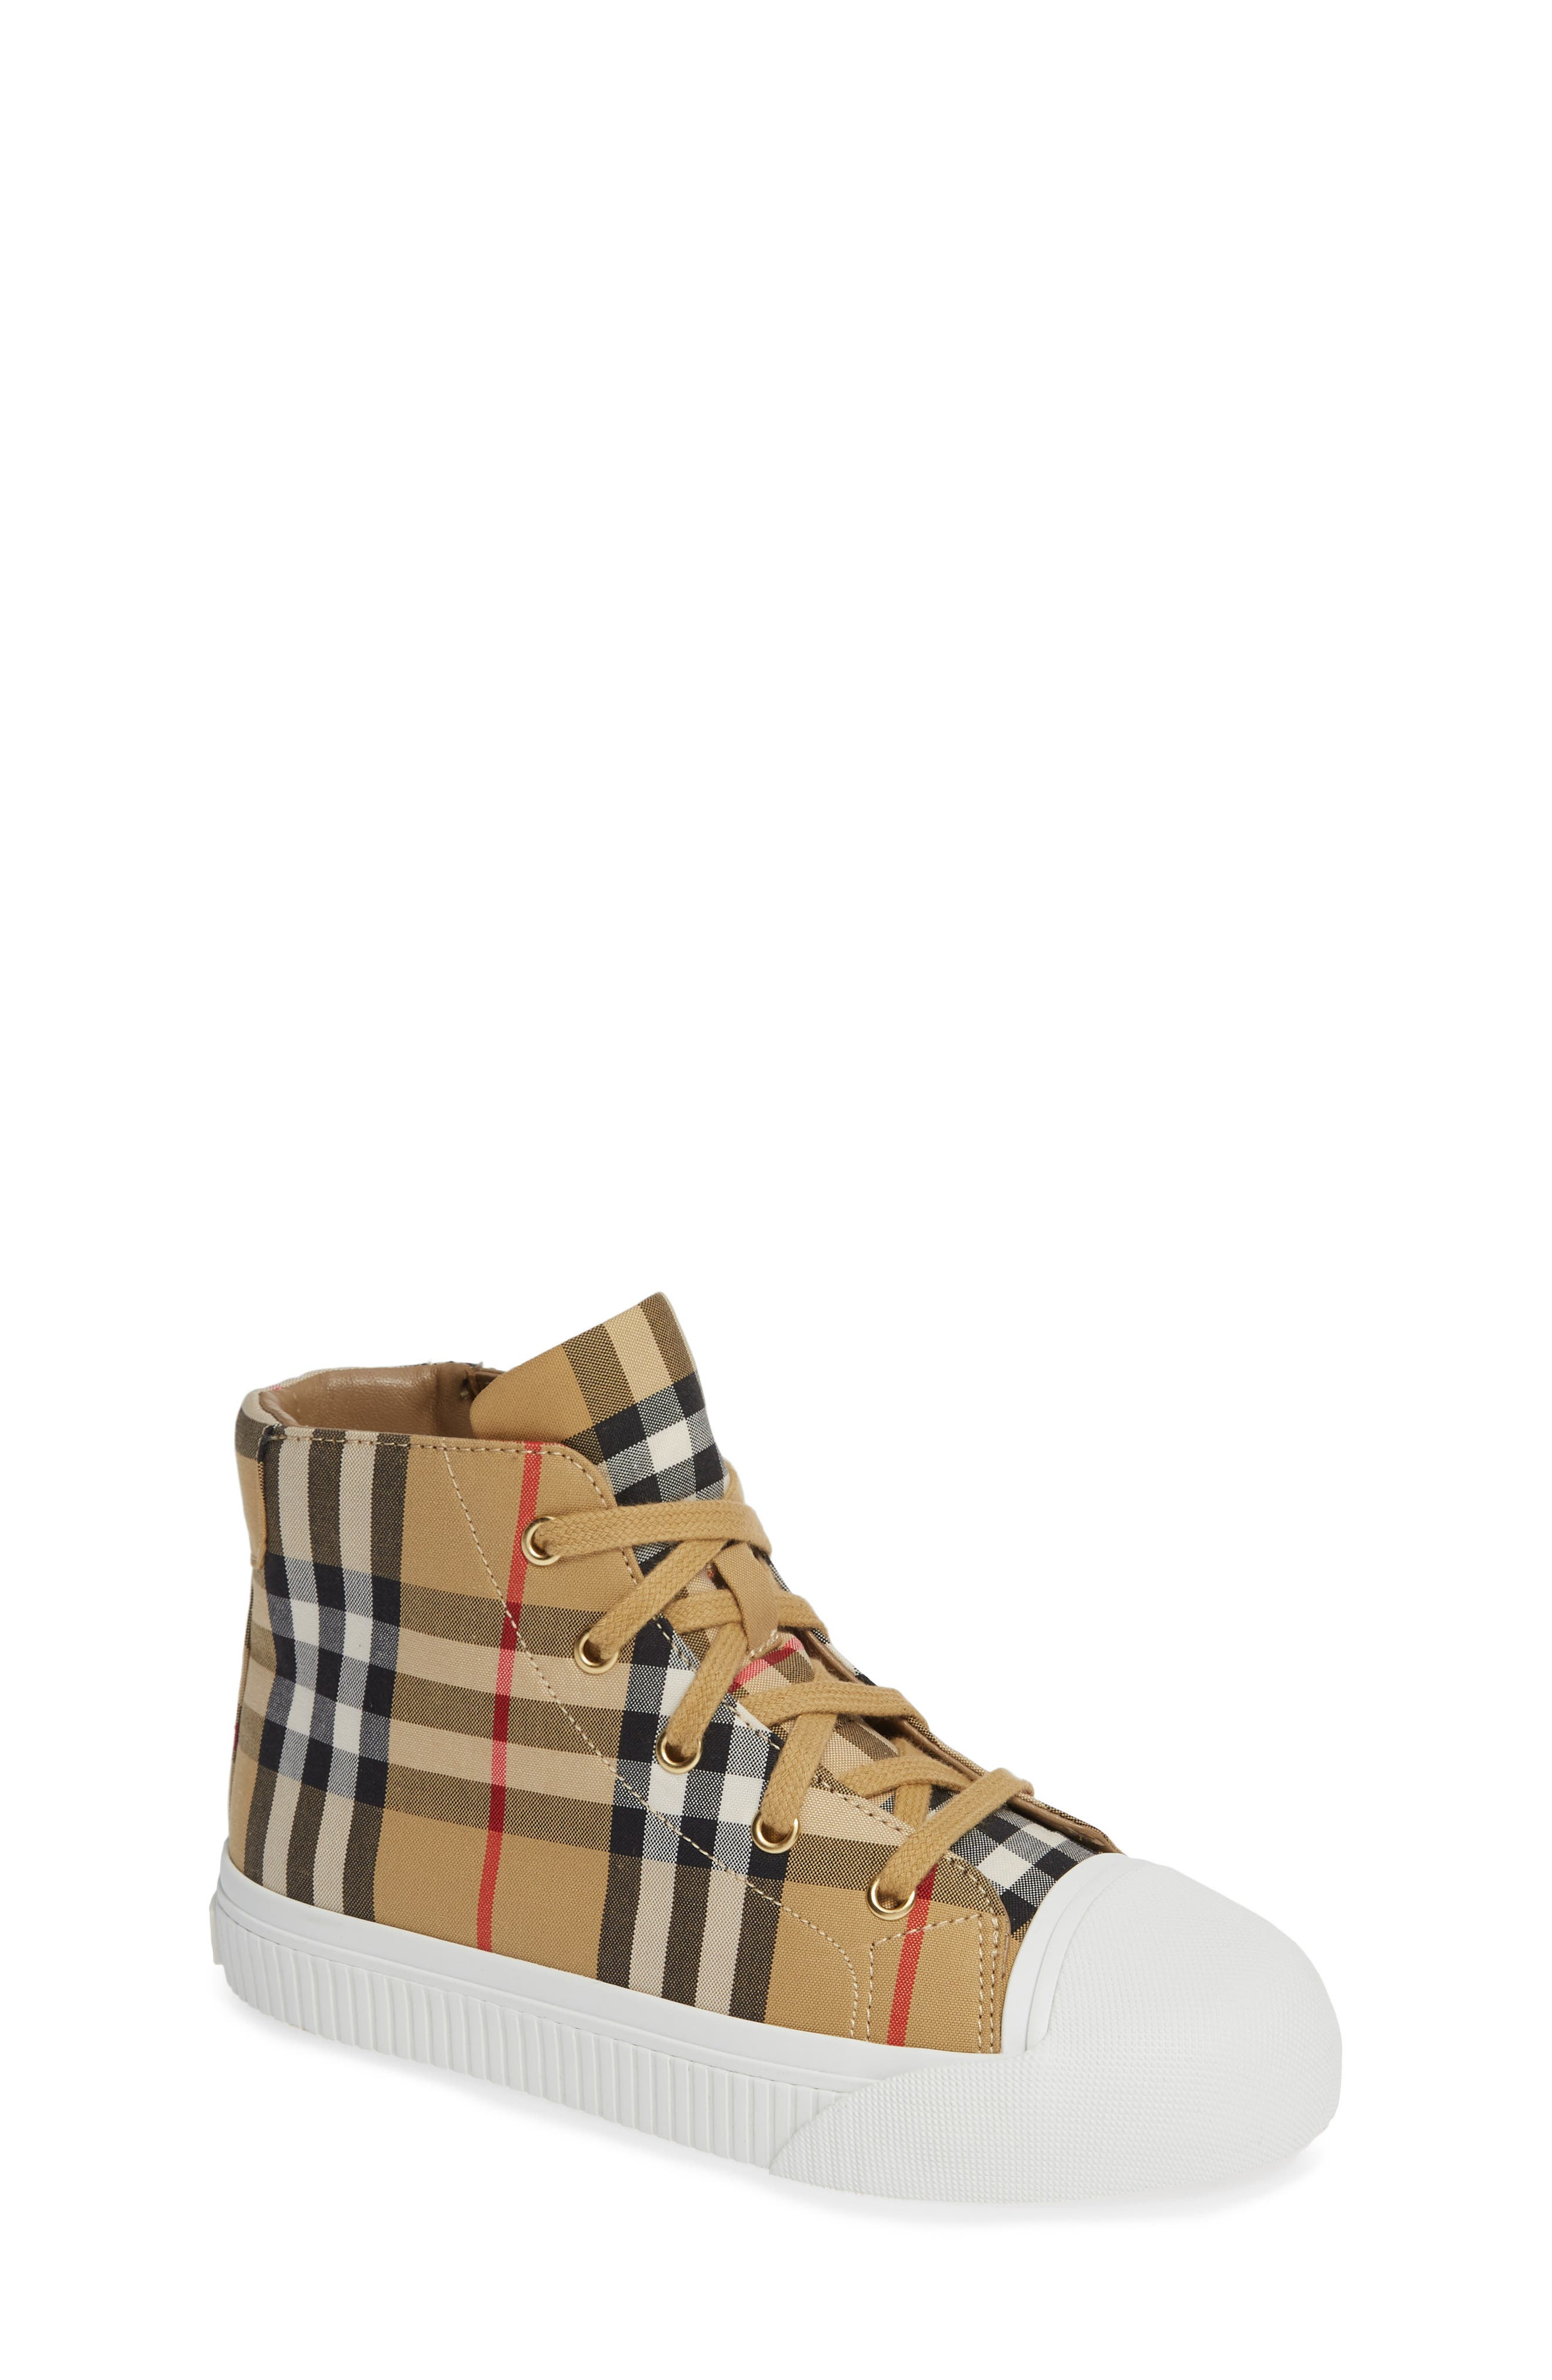 Burberry Belford High-Top Sneaker